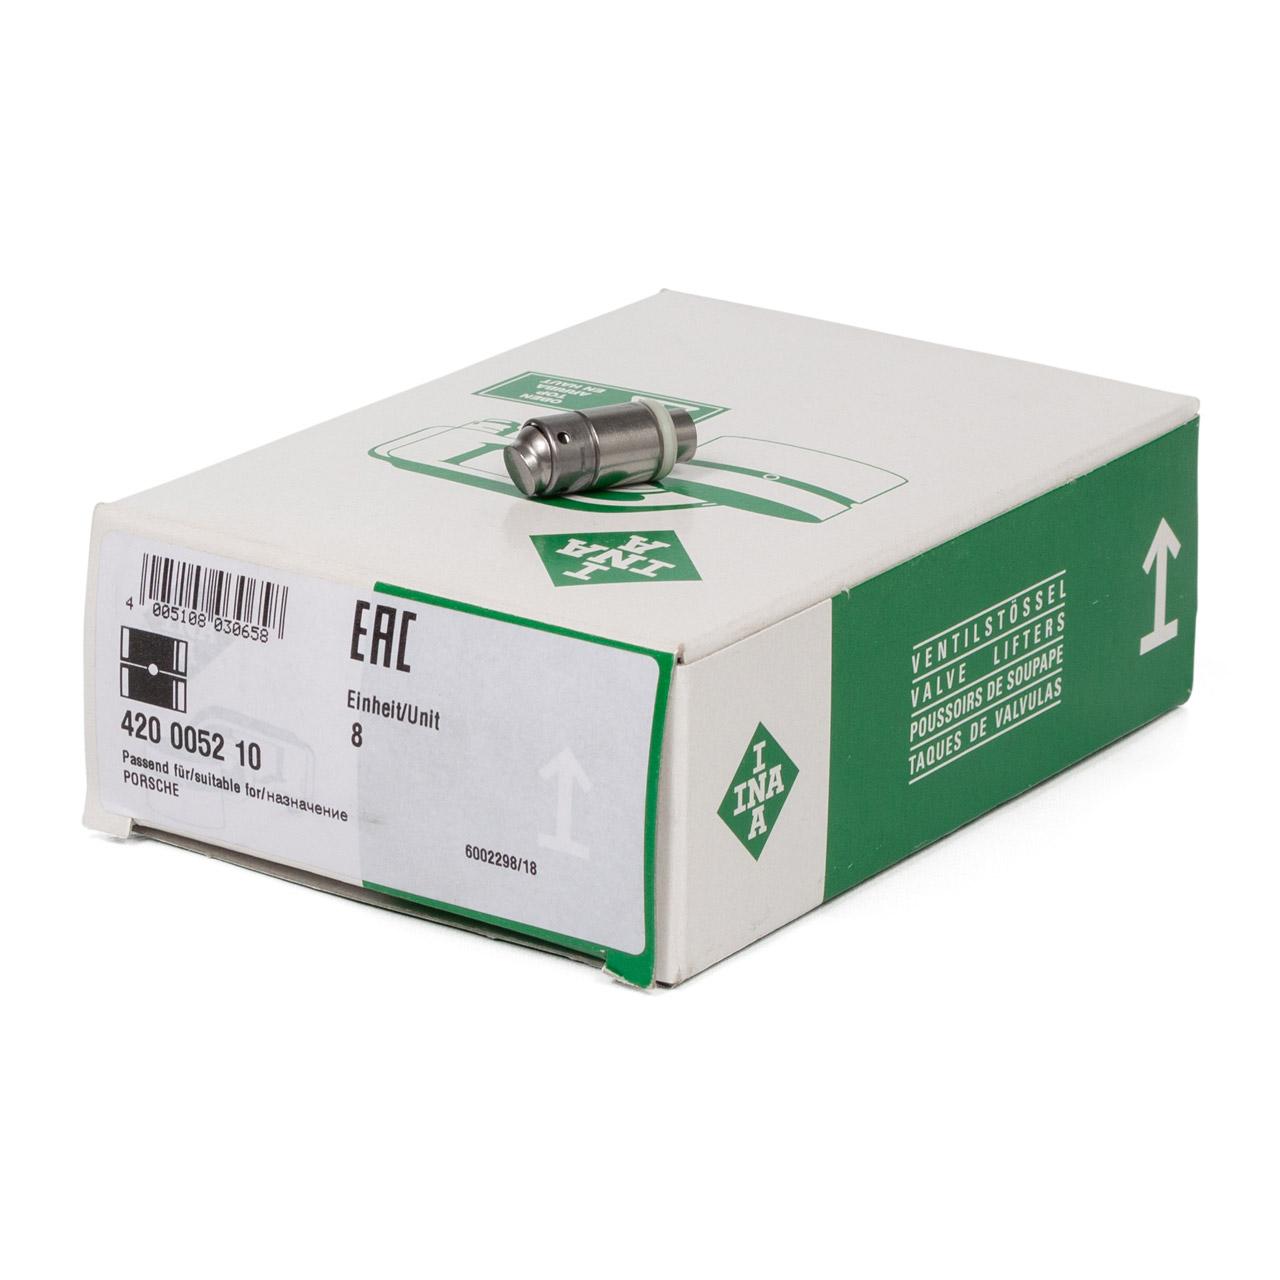 8x INA 420005210 Ventilstössel Hydrostössel PORSCHE 993 3.6 / 3.8 Carrera